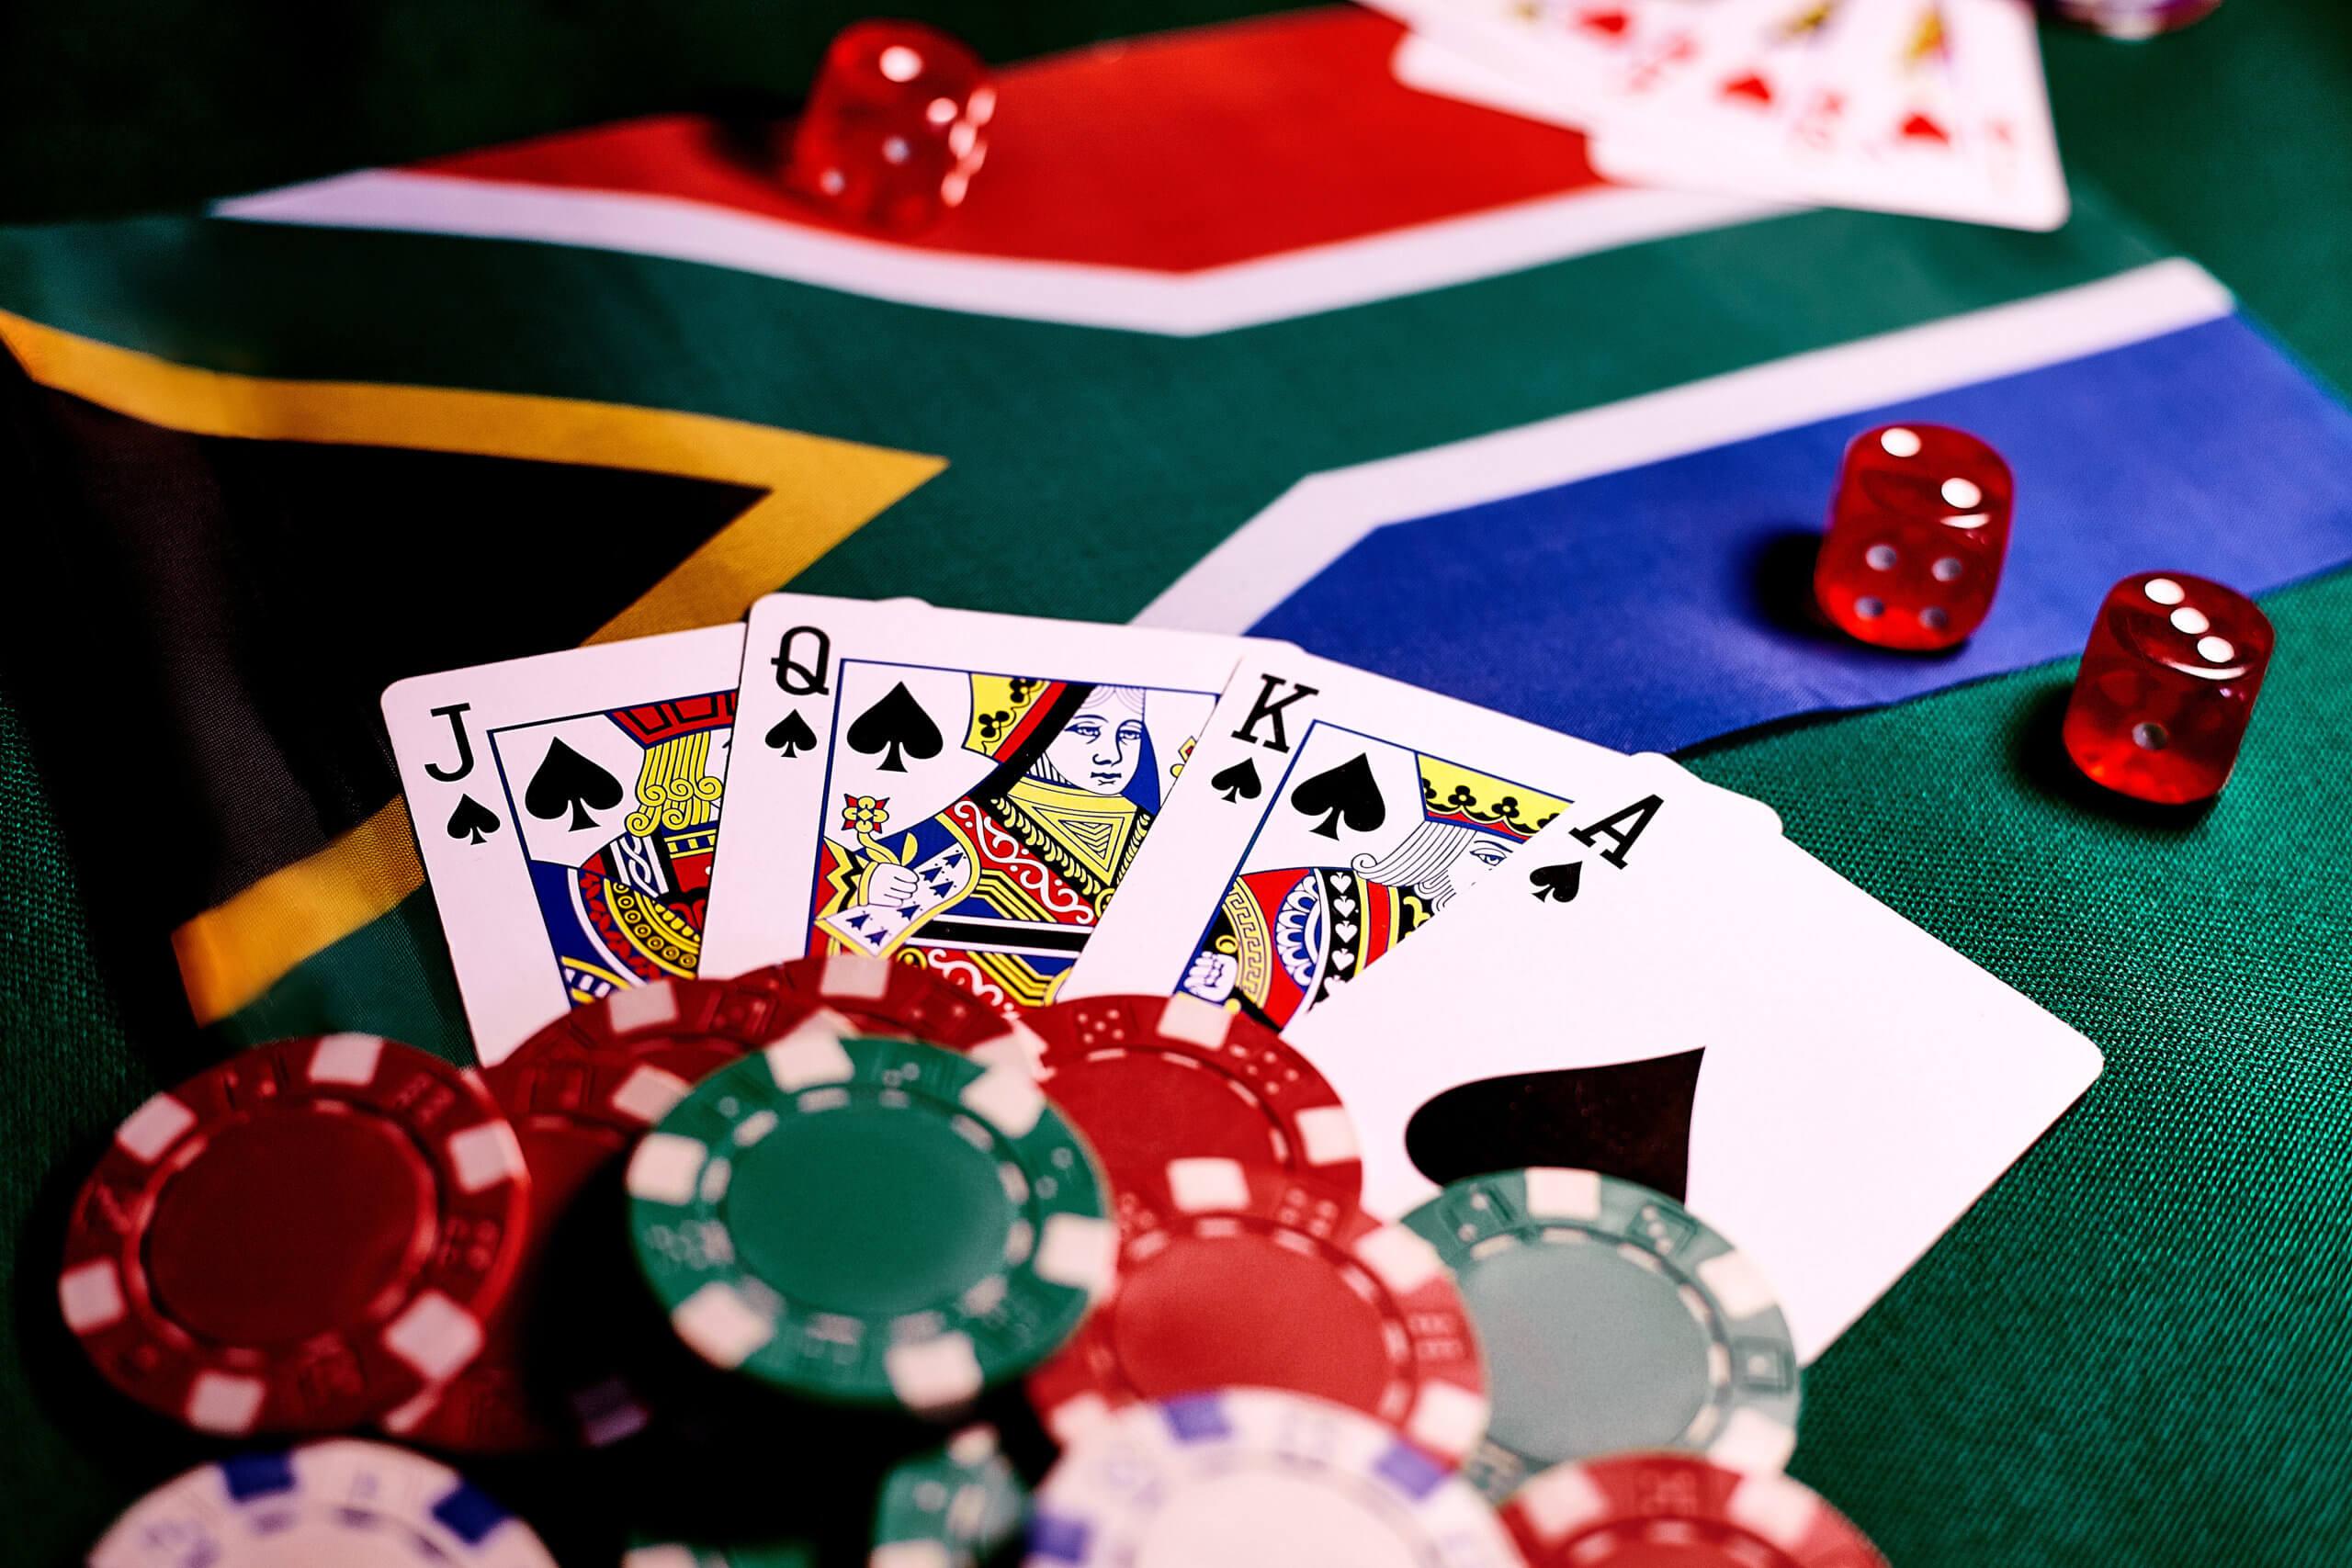 Poker Chips Gambling Casino Card Game Spades Suit